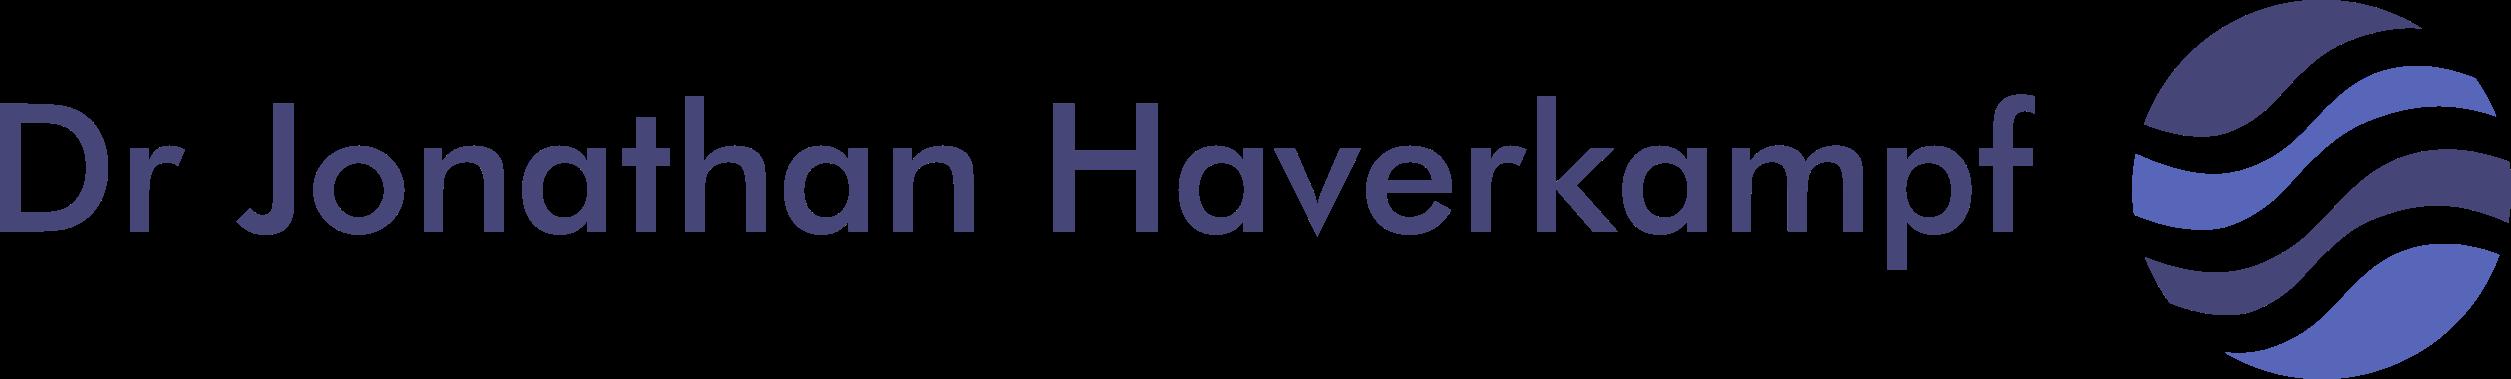 Christian Jonathan Haverkampf logo